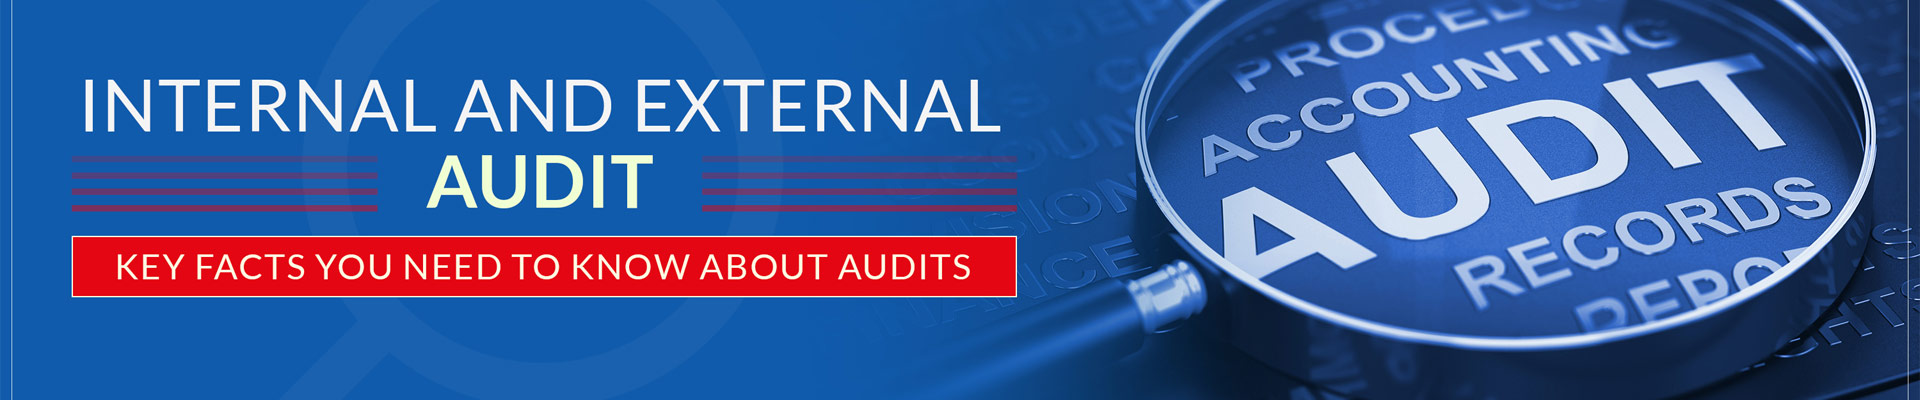 dicis-internal-external-audit-key-facts